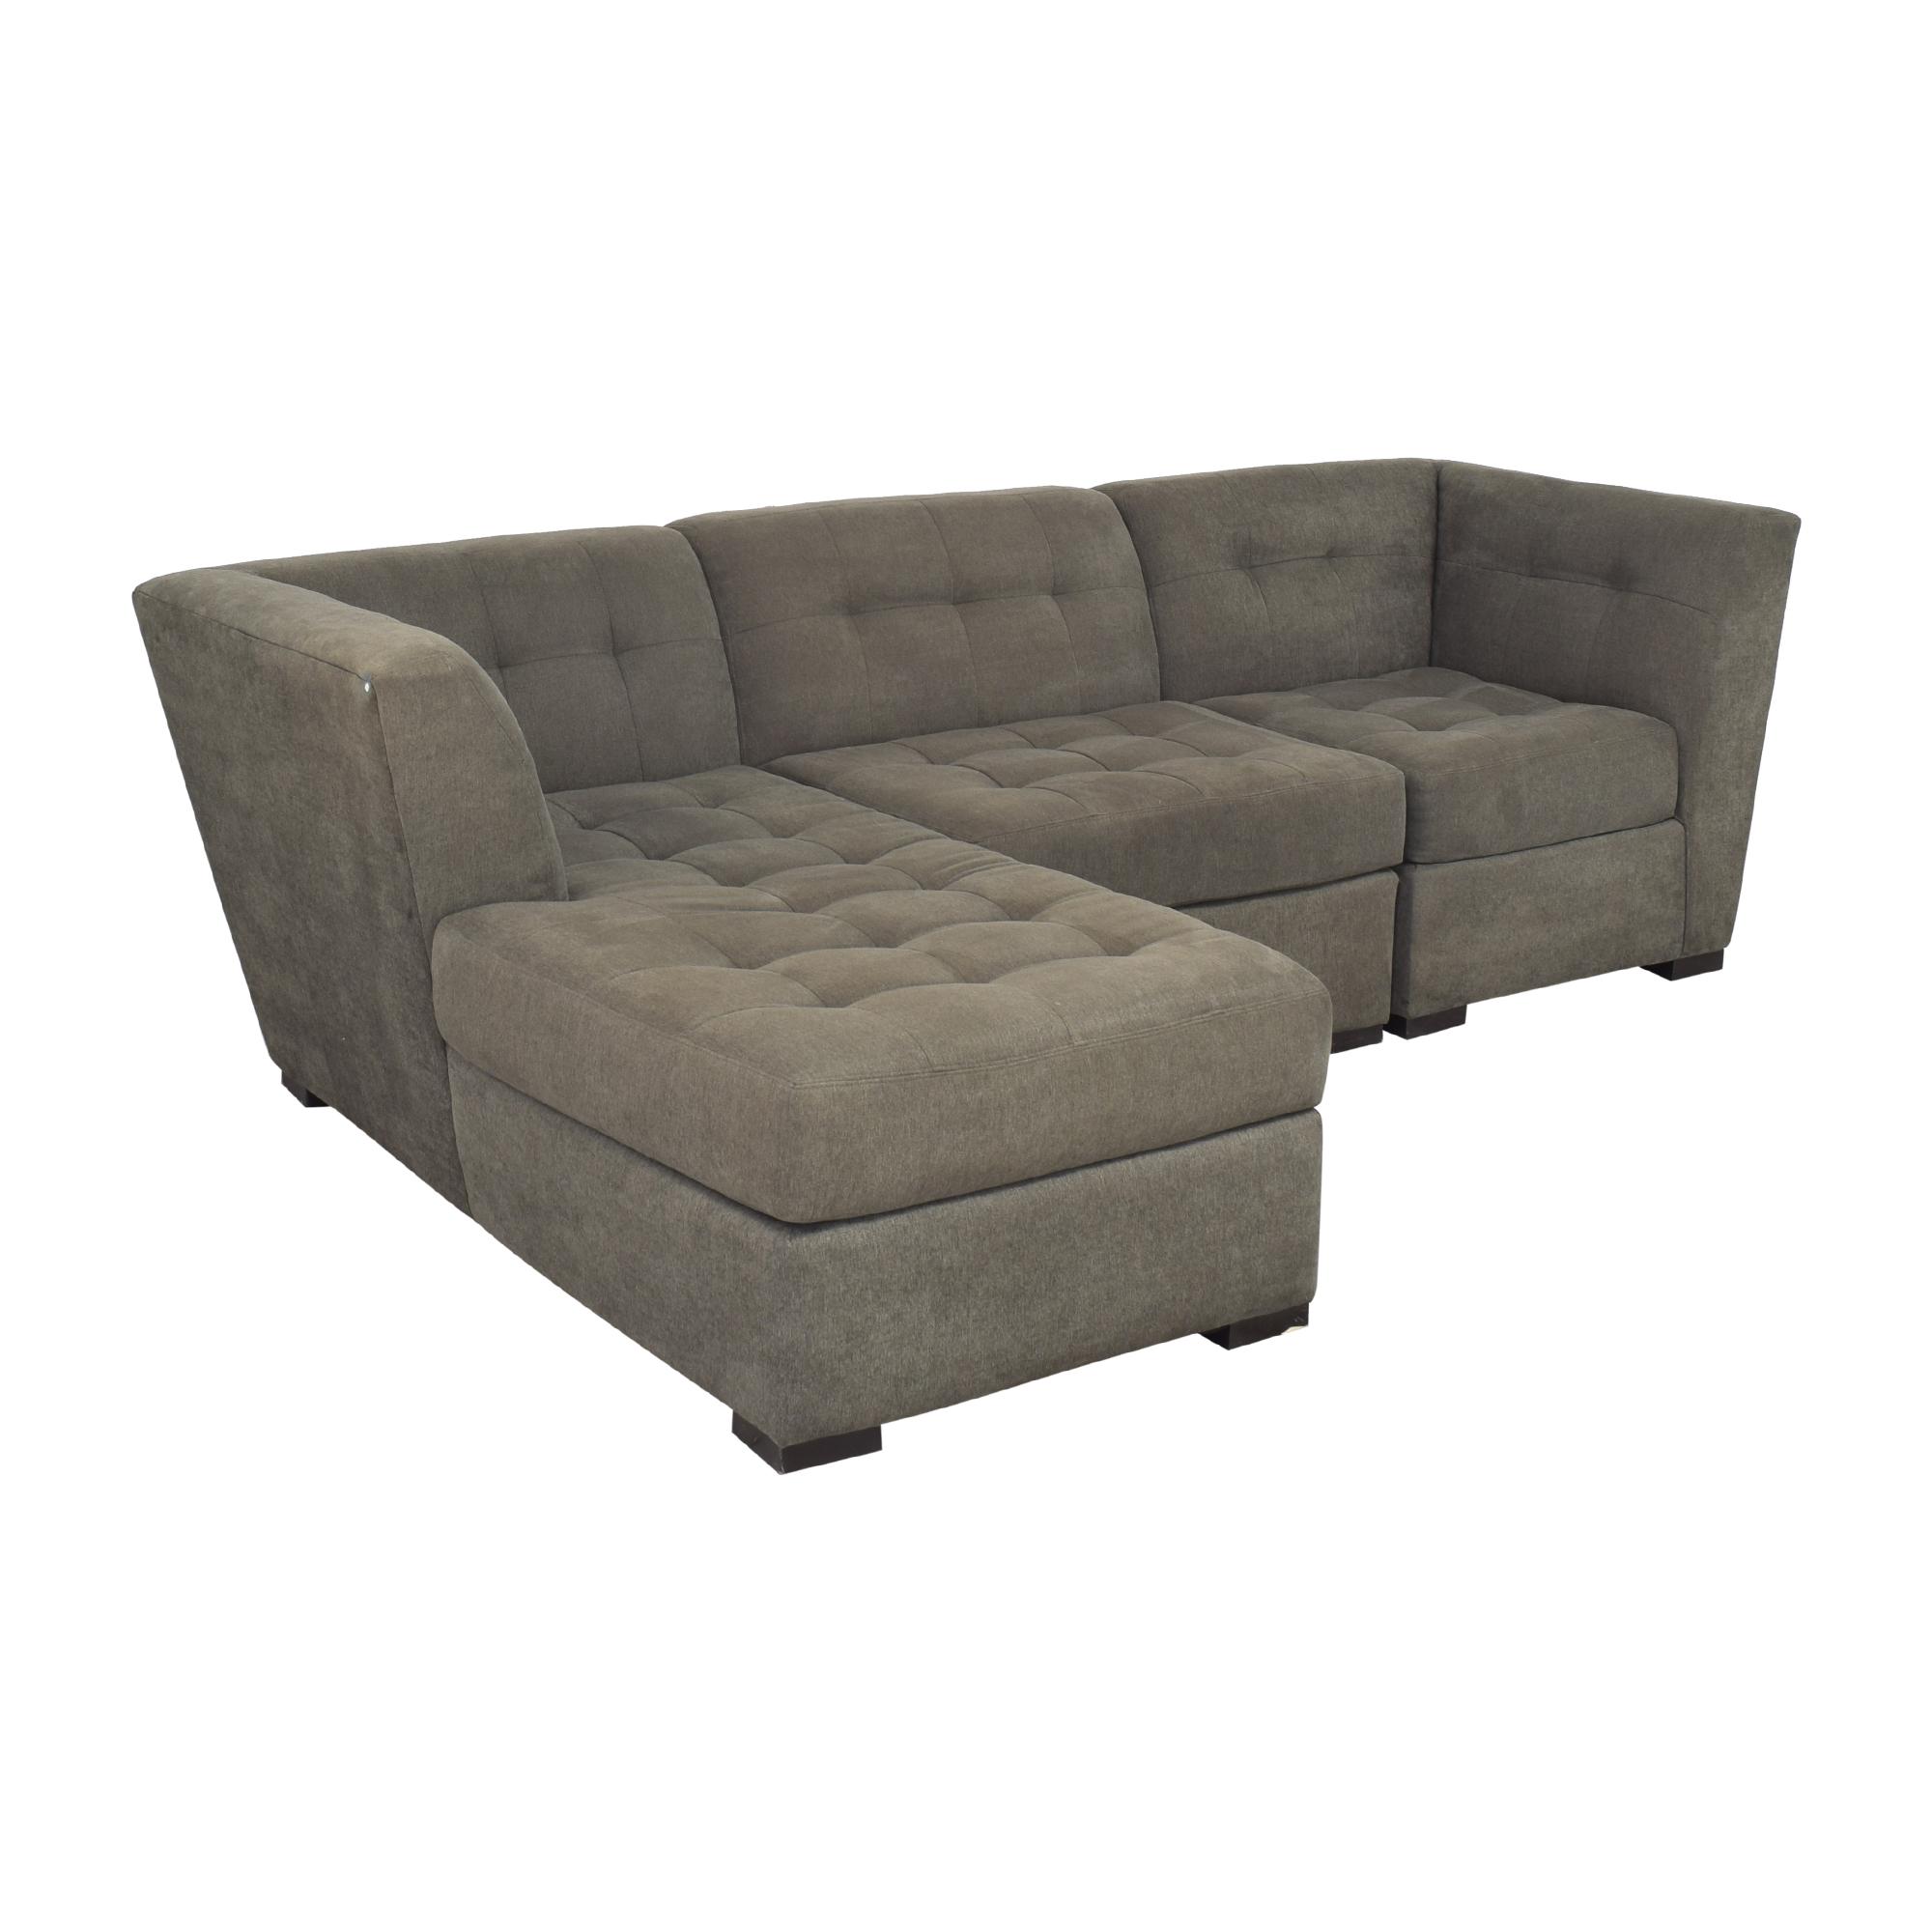 shop Macy's Macy's Roxanne II Chaise Sectional Sofa online